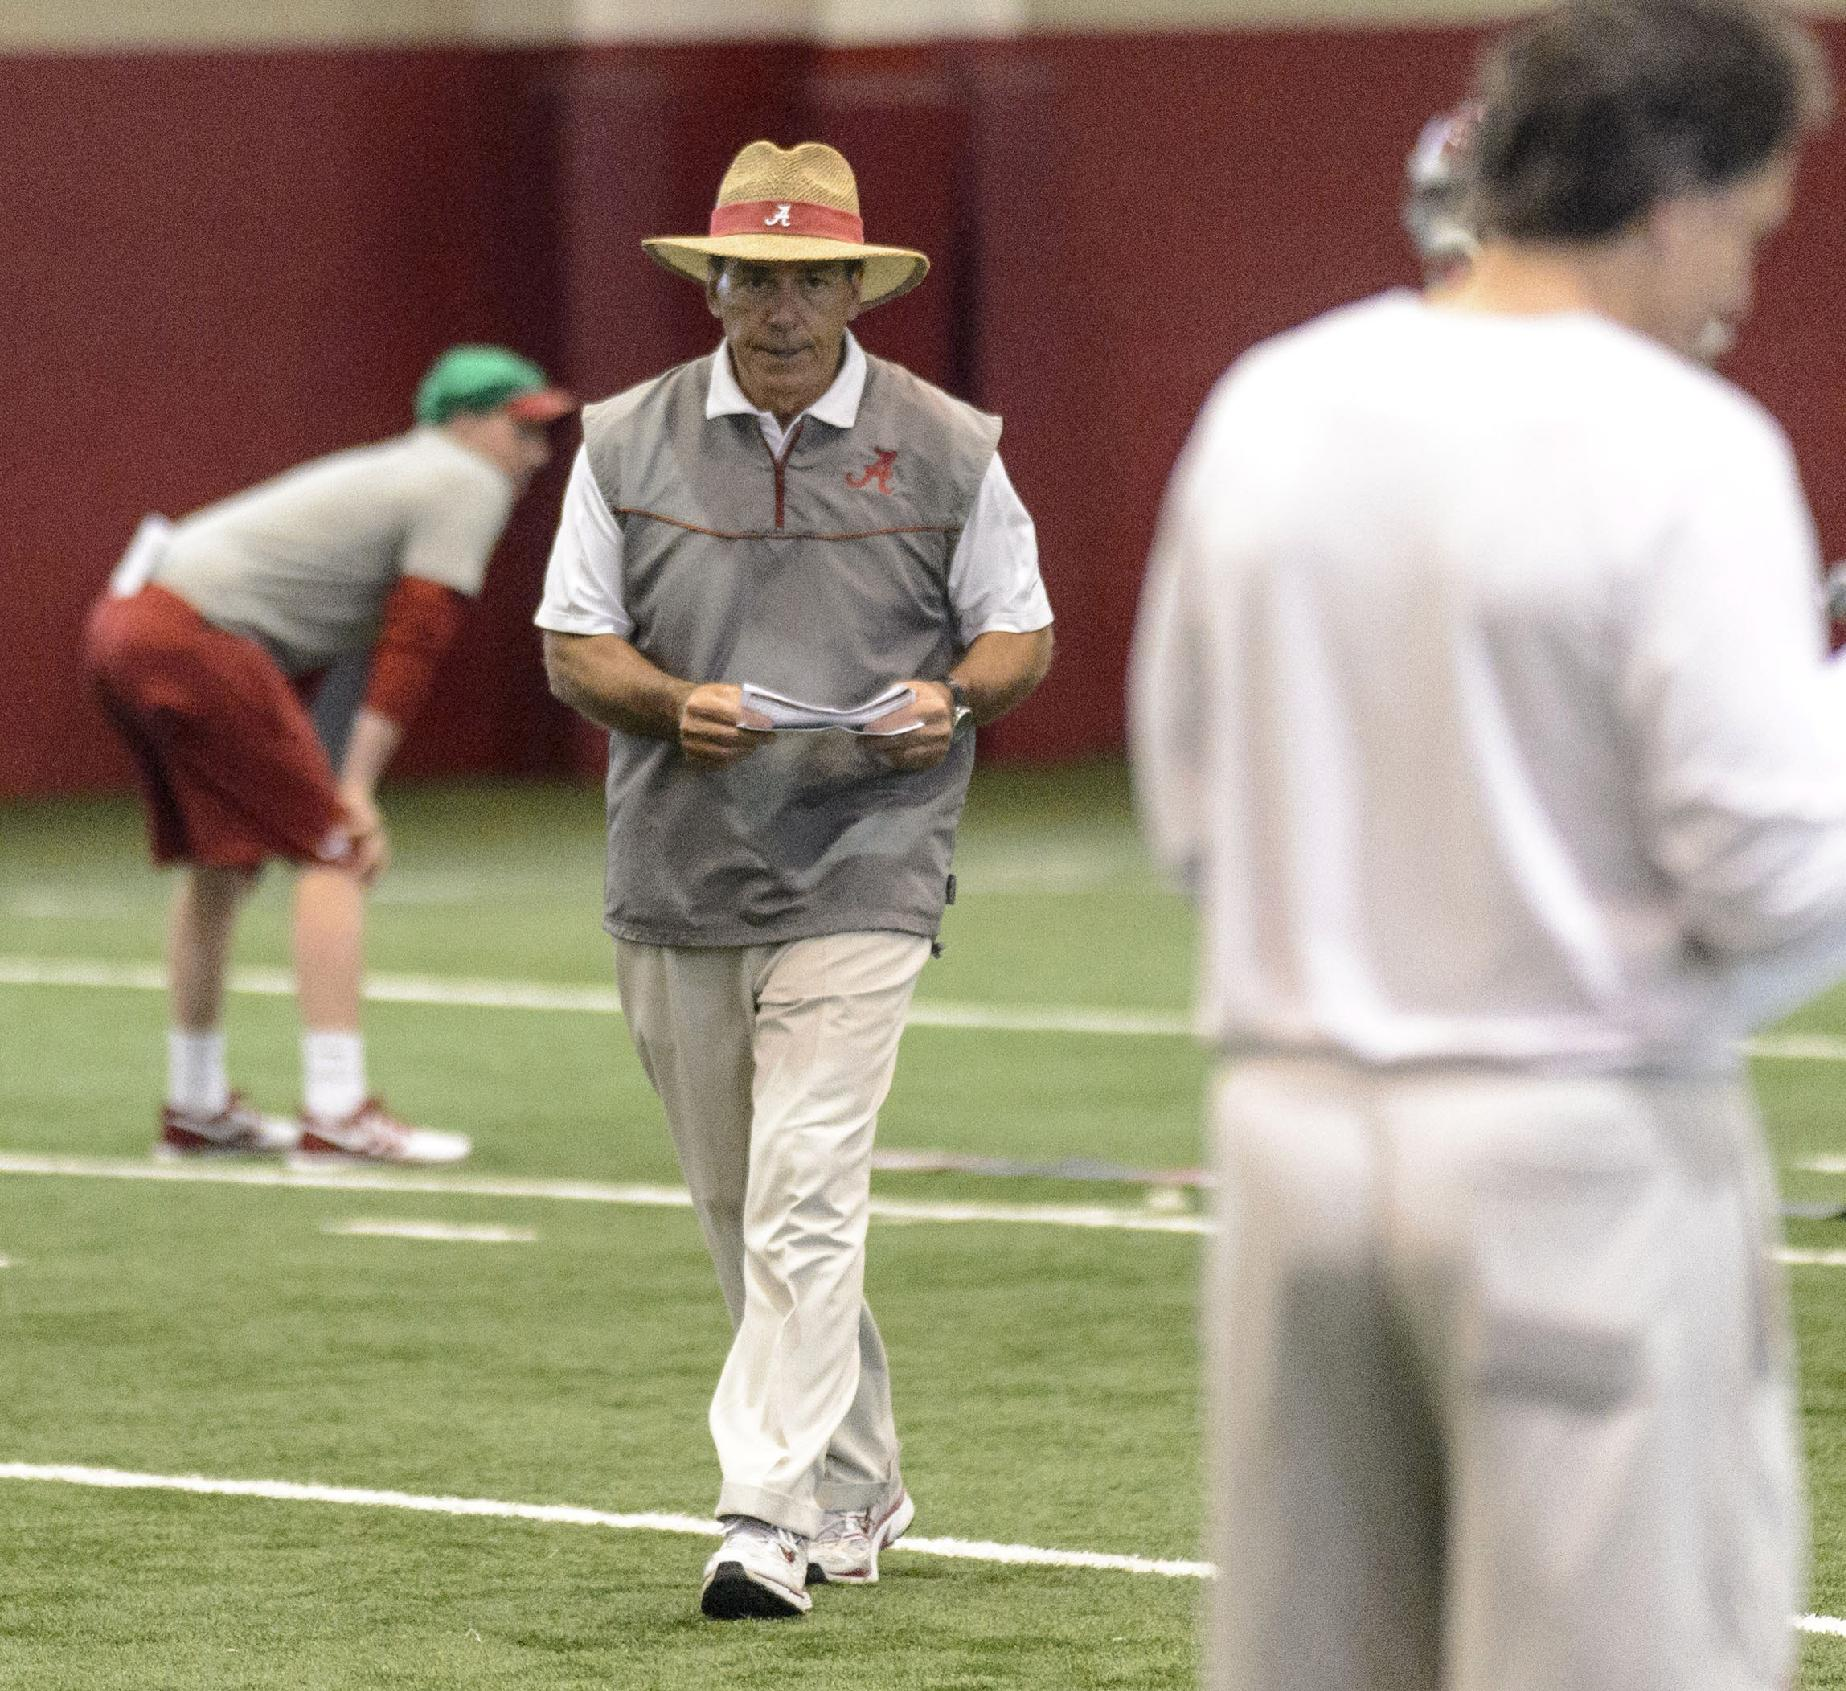 Alabama head coach Nick Saban tracks his defense during NCAA college football practice on Friday, April 4, 2014, in Tuscaloosa, Ala